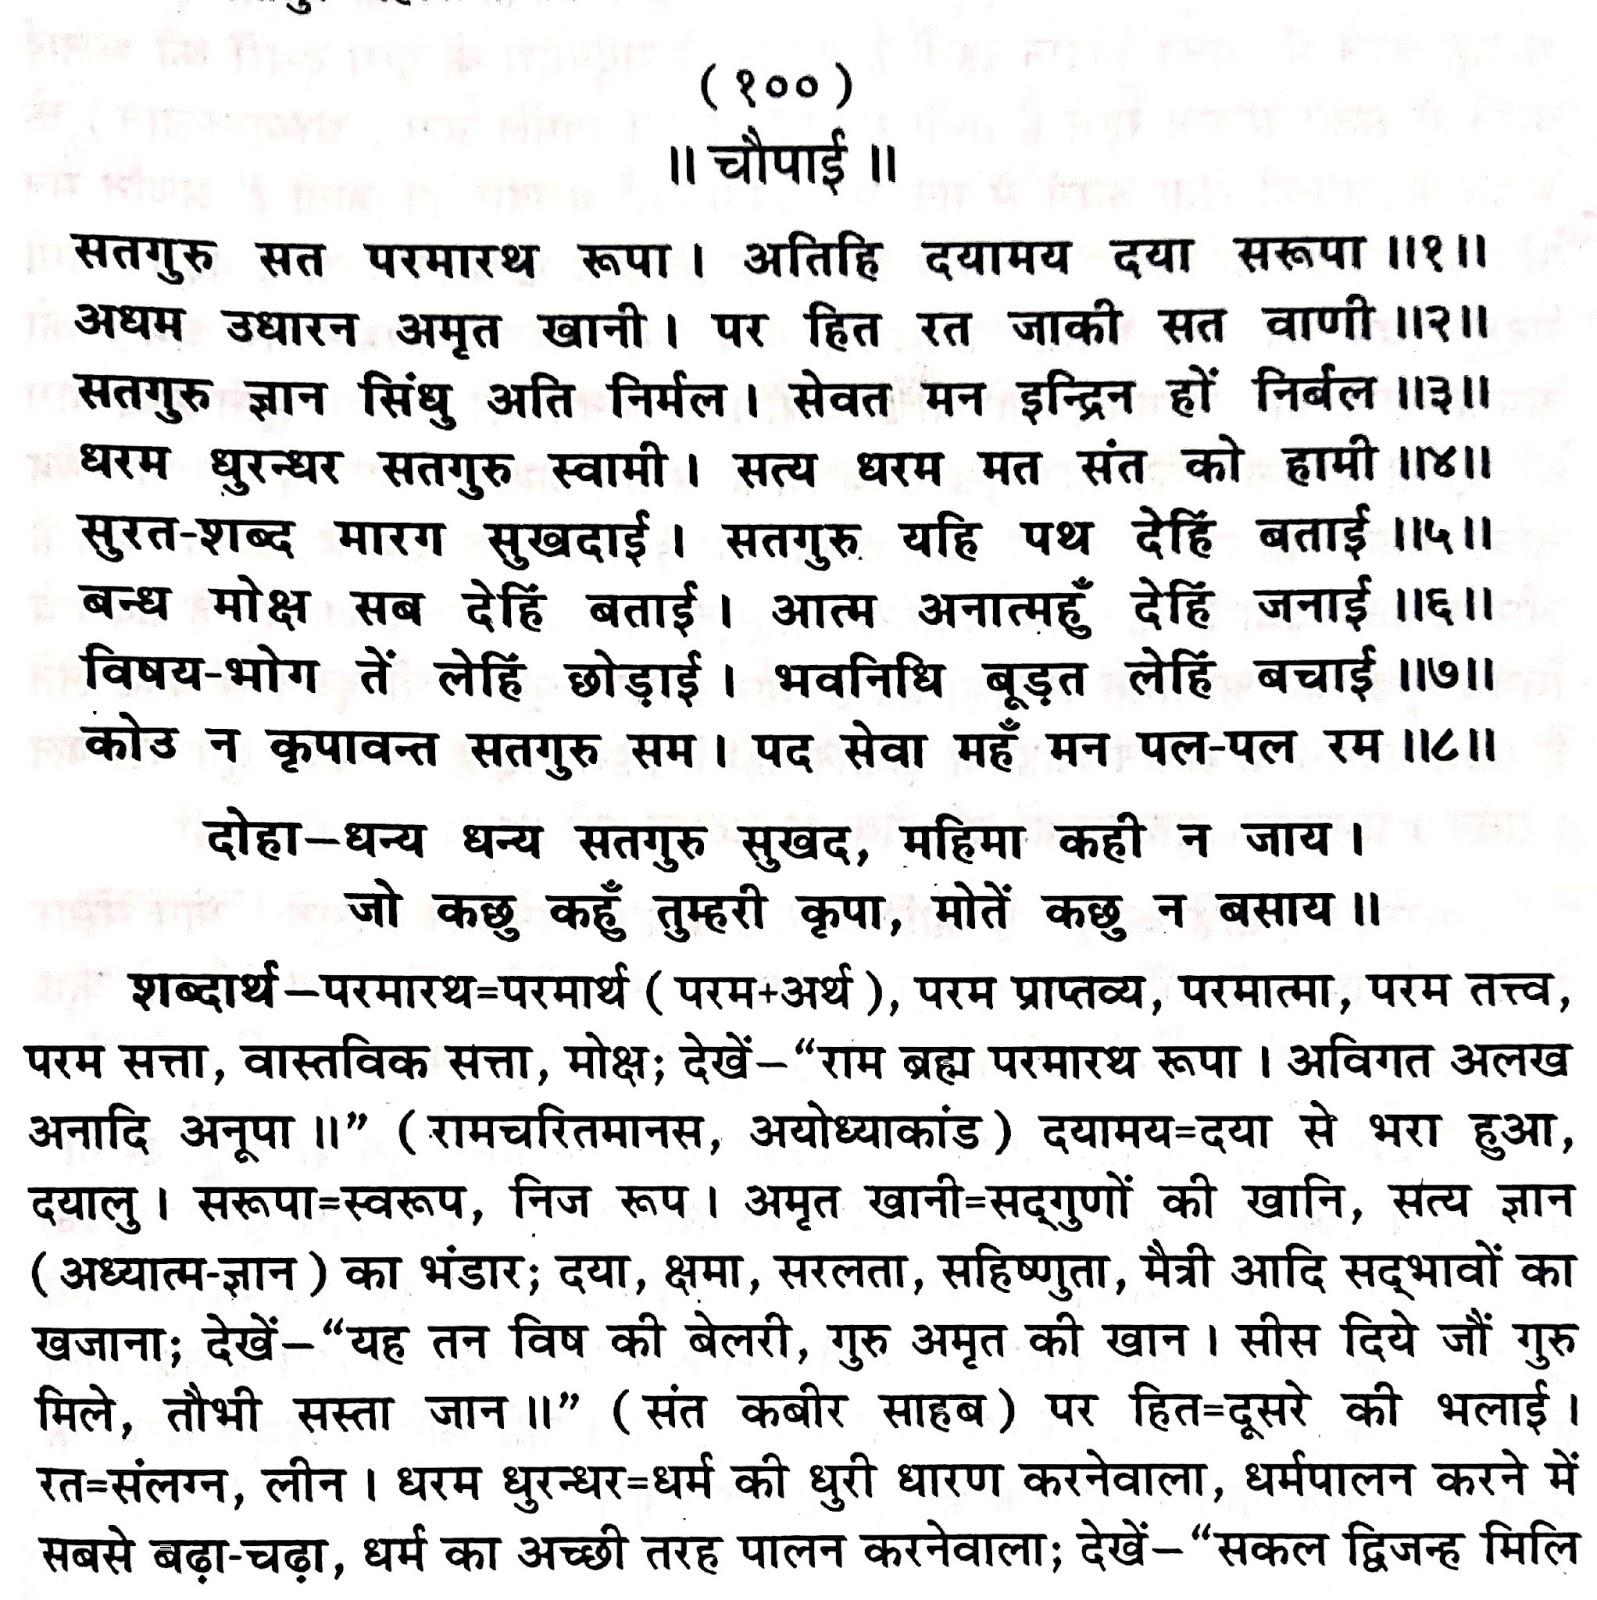 "P100, Benefits of making a guru ""सतगुरु सत परमारथ रूपा।,..."" महर्षि मेंहीं पदावली अर्थ सहित। पदावली भजन नंबर 100 और शब्दार्थ।"